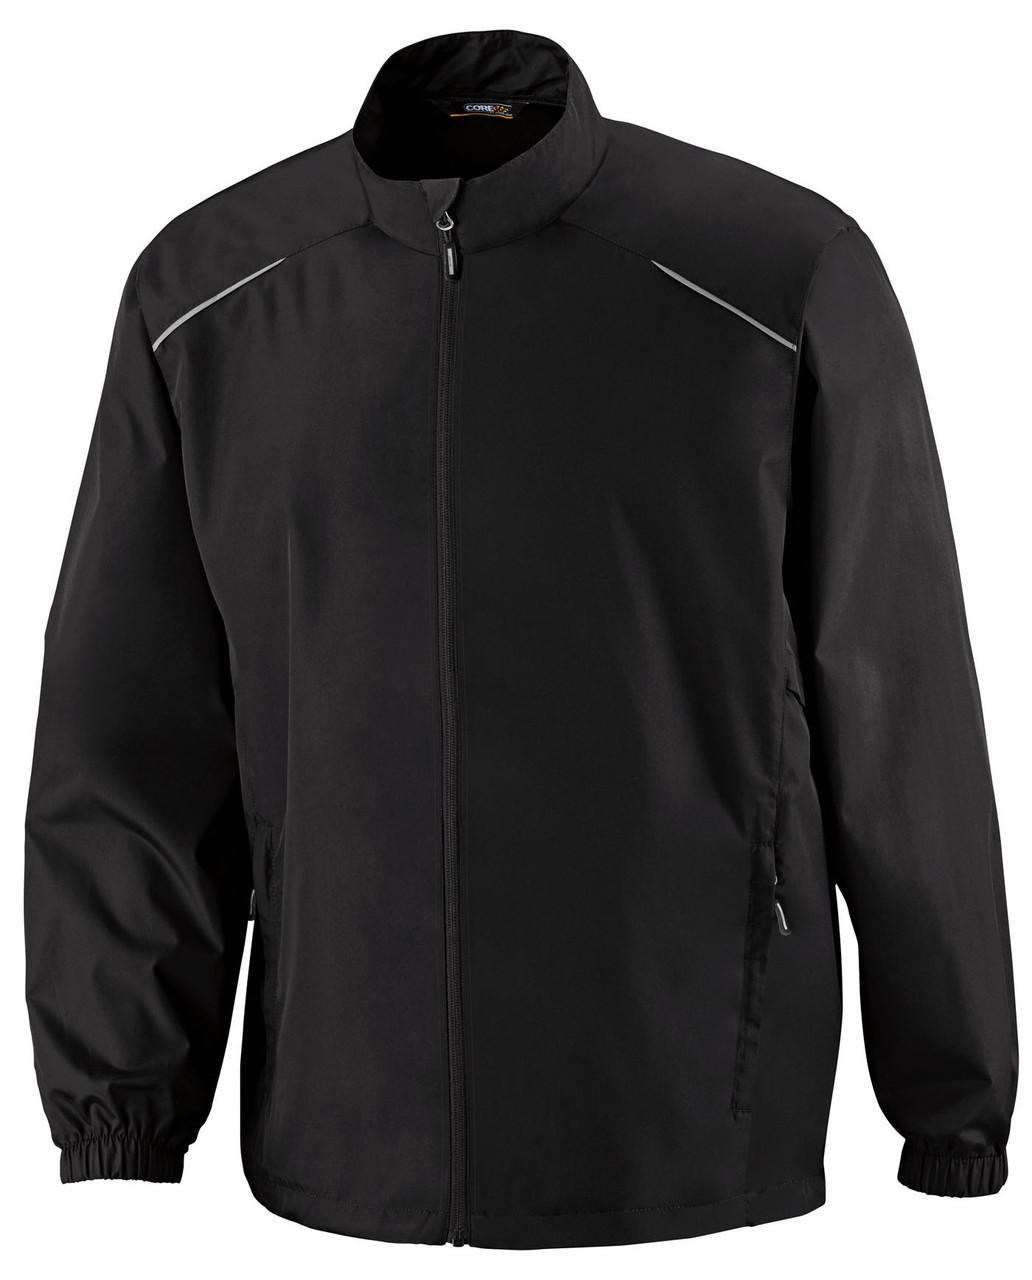 Black Lightweight Jacket - Dr Pepper Snapple Group Uniform Store